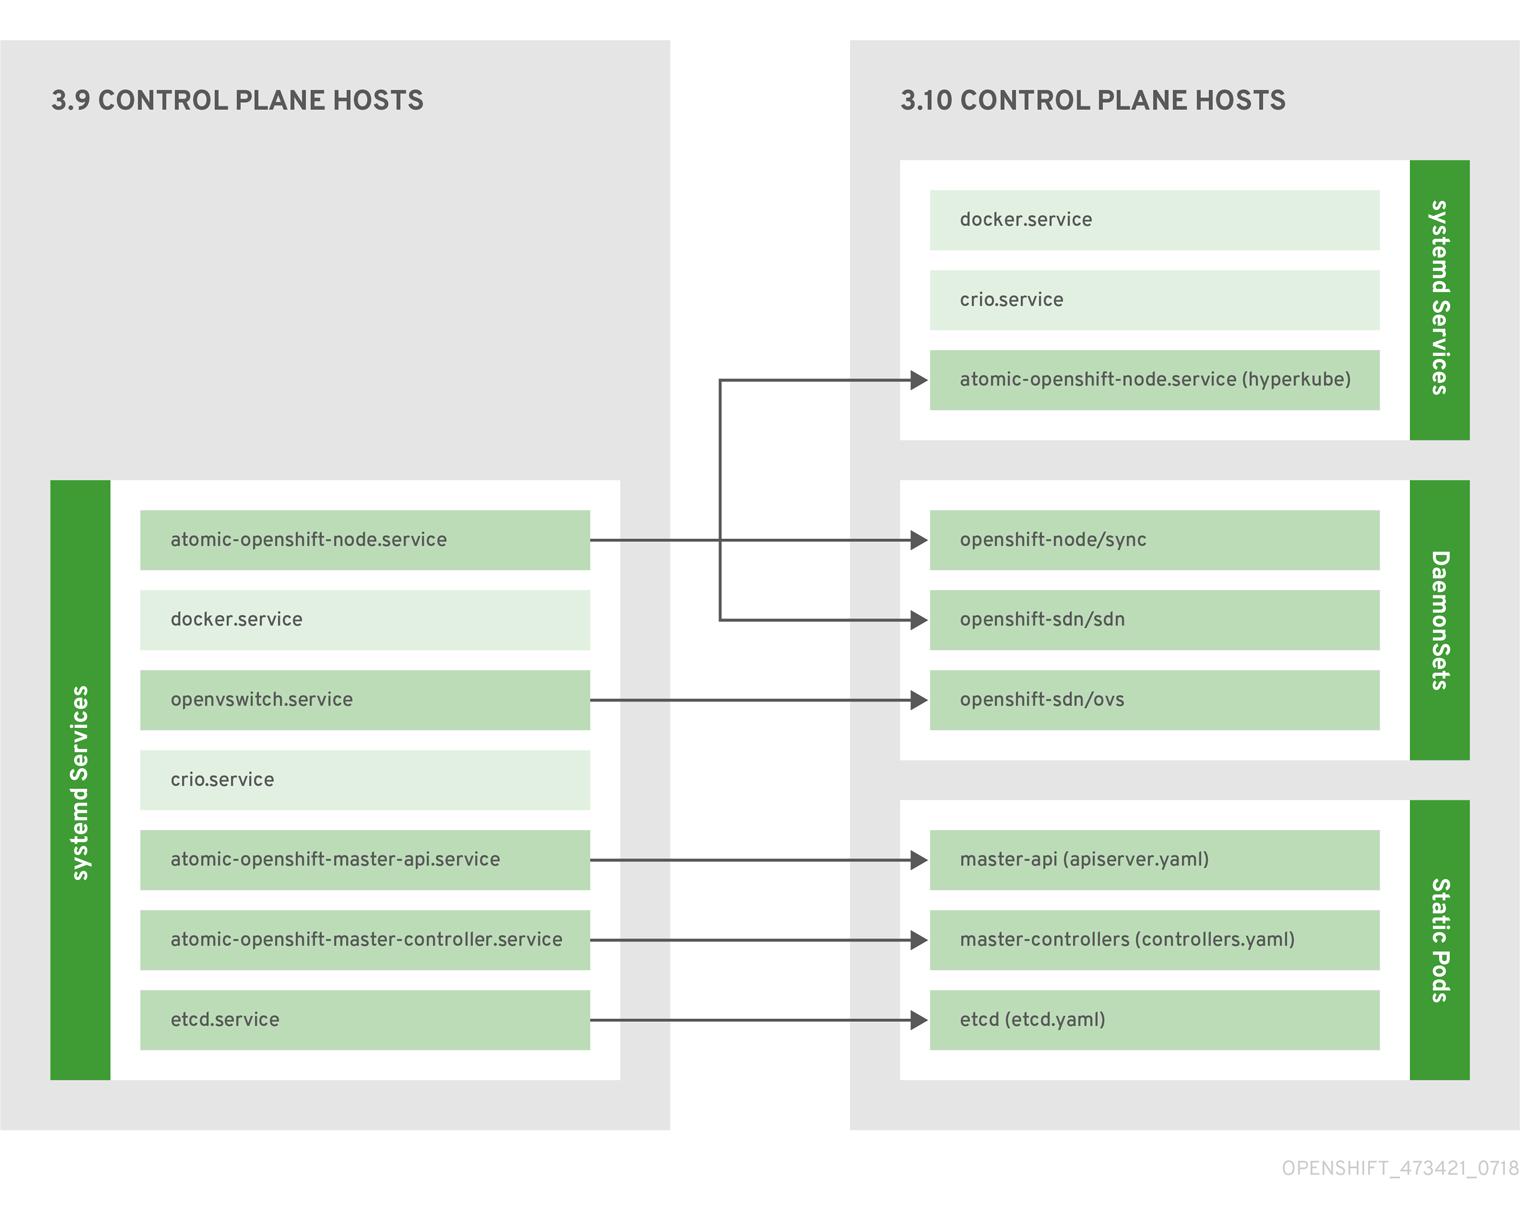 Control plane host architecture changes